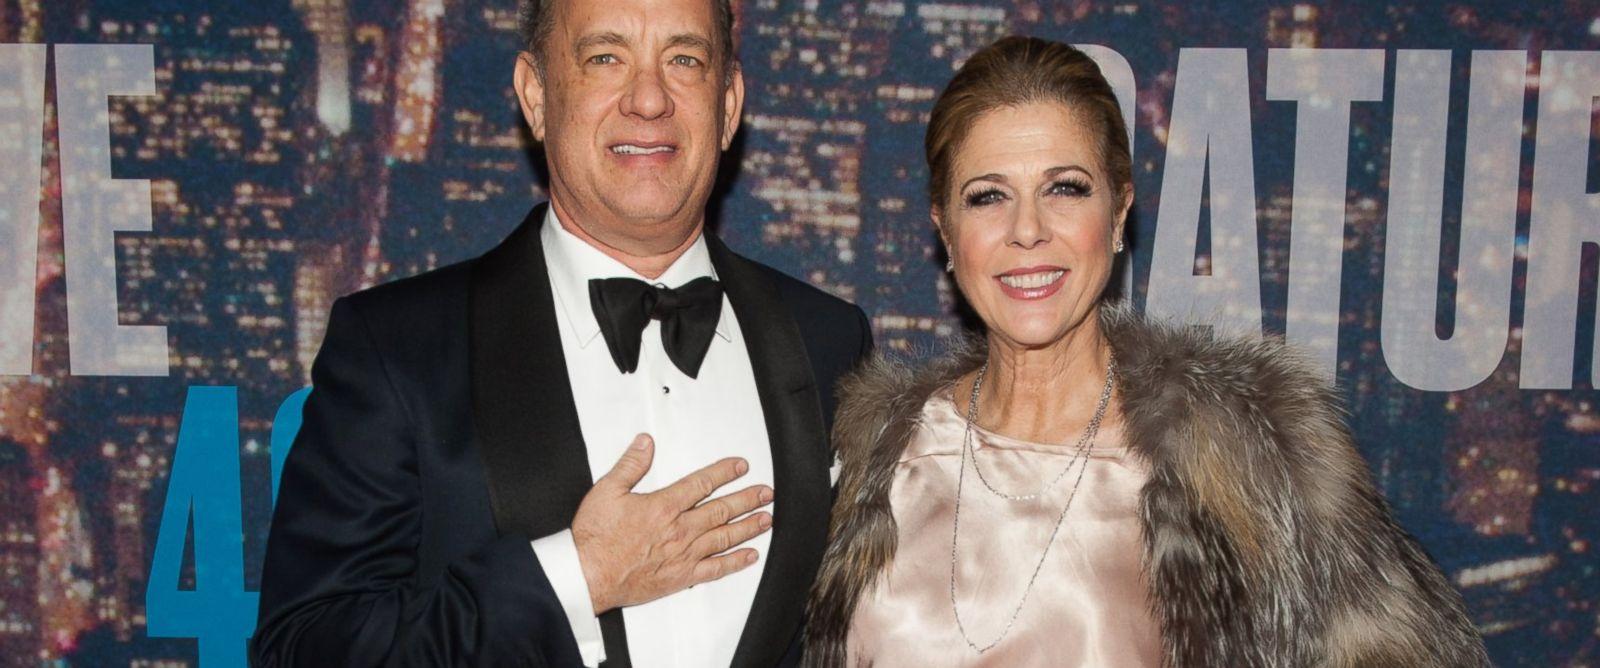 PHOTO: Tom Hanks and Rita Wilson attend the SNL 40th Anniversary Celebration at Rockefeller Plaza, Feb. 15, 2015, in New York.